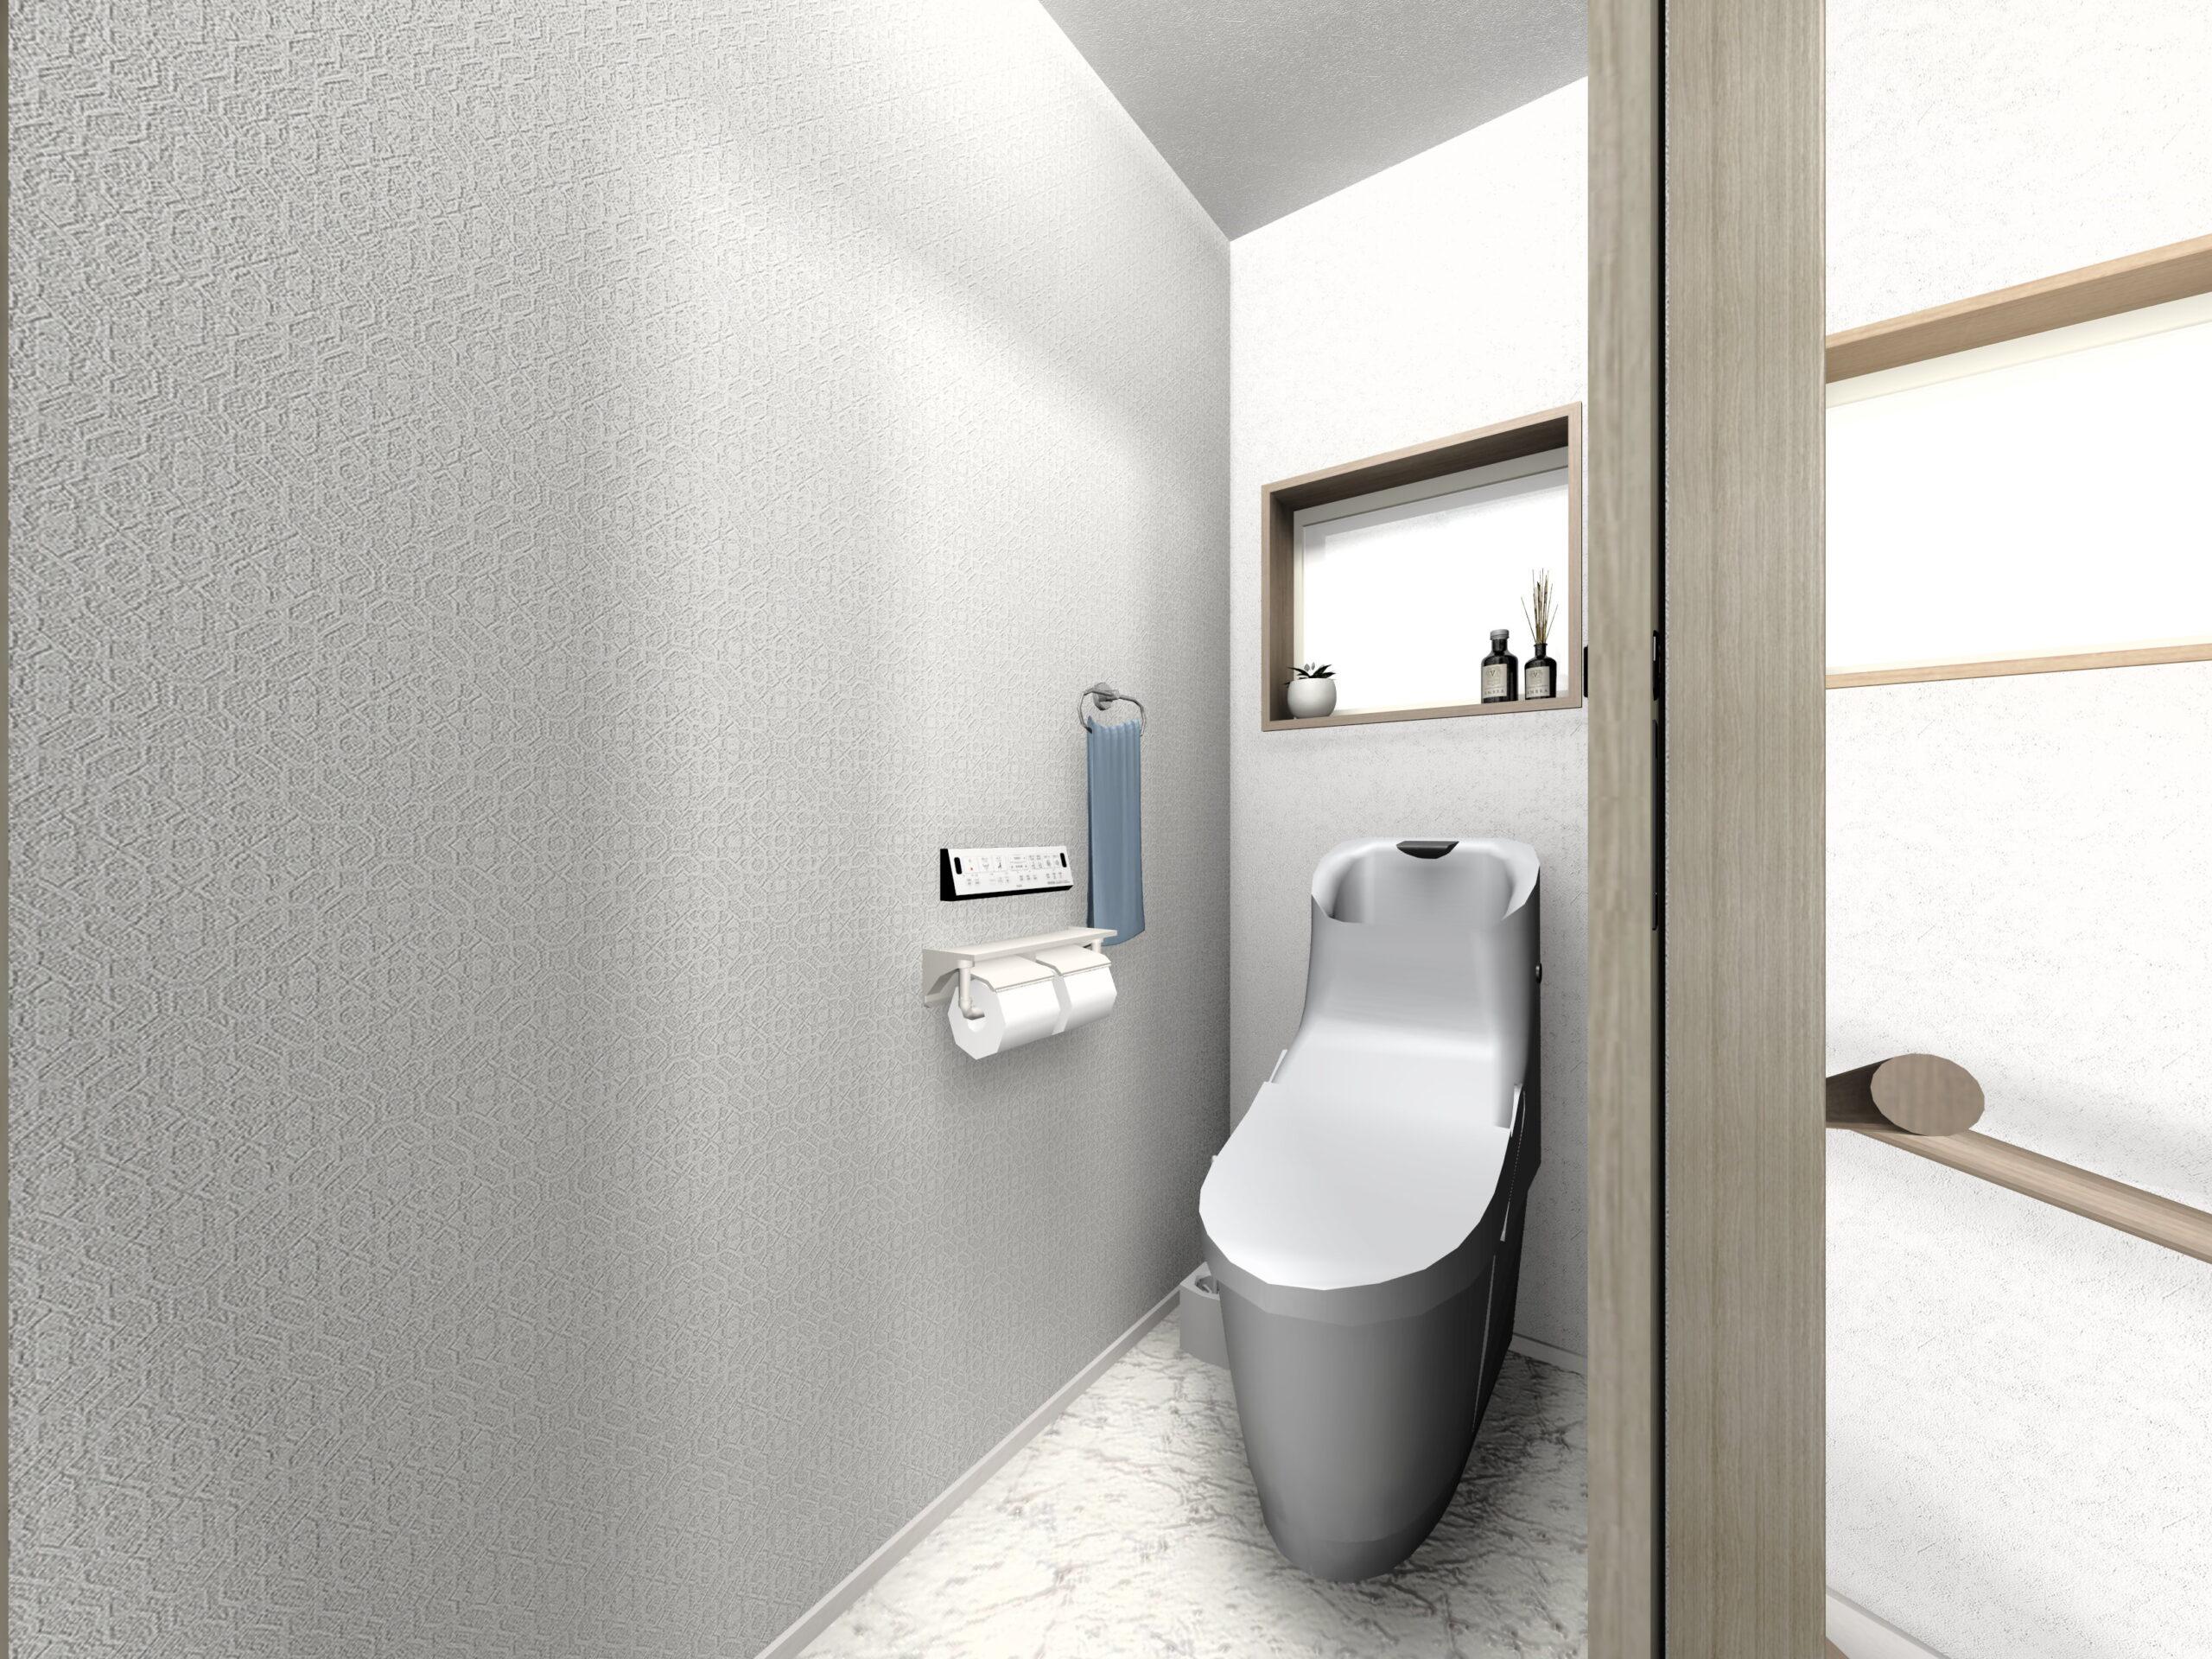 武雄市新築住宅OURS甘久1号地2Fトイレ